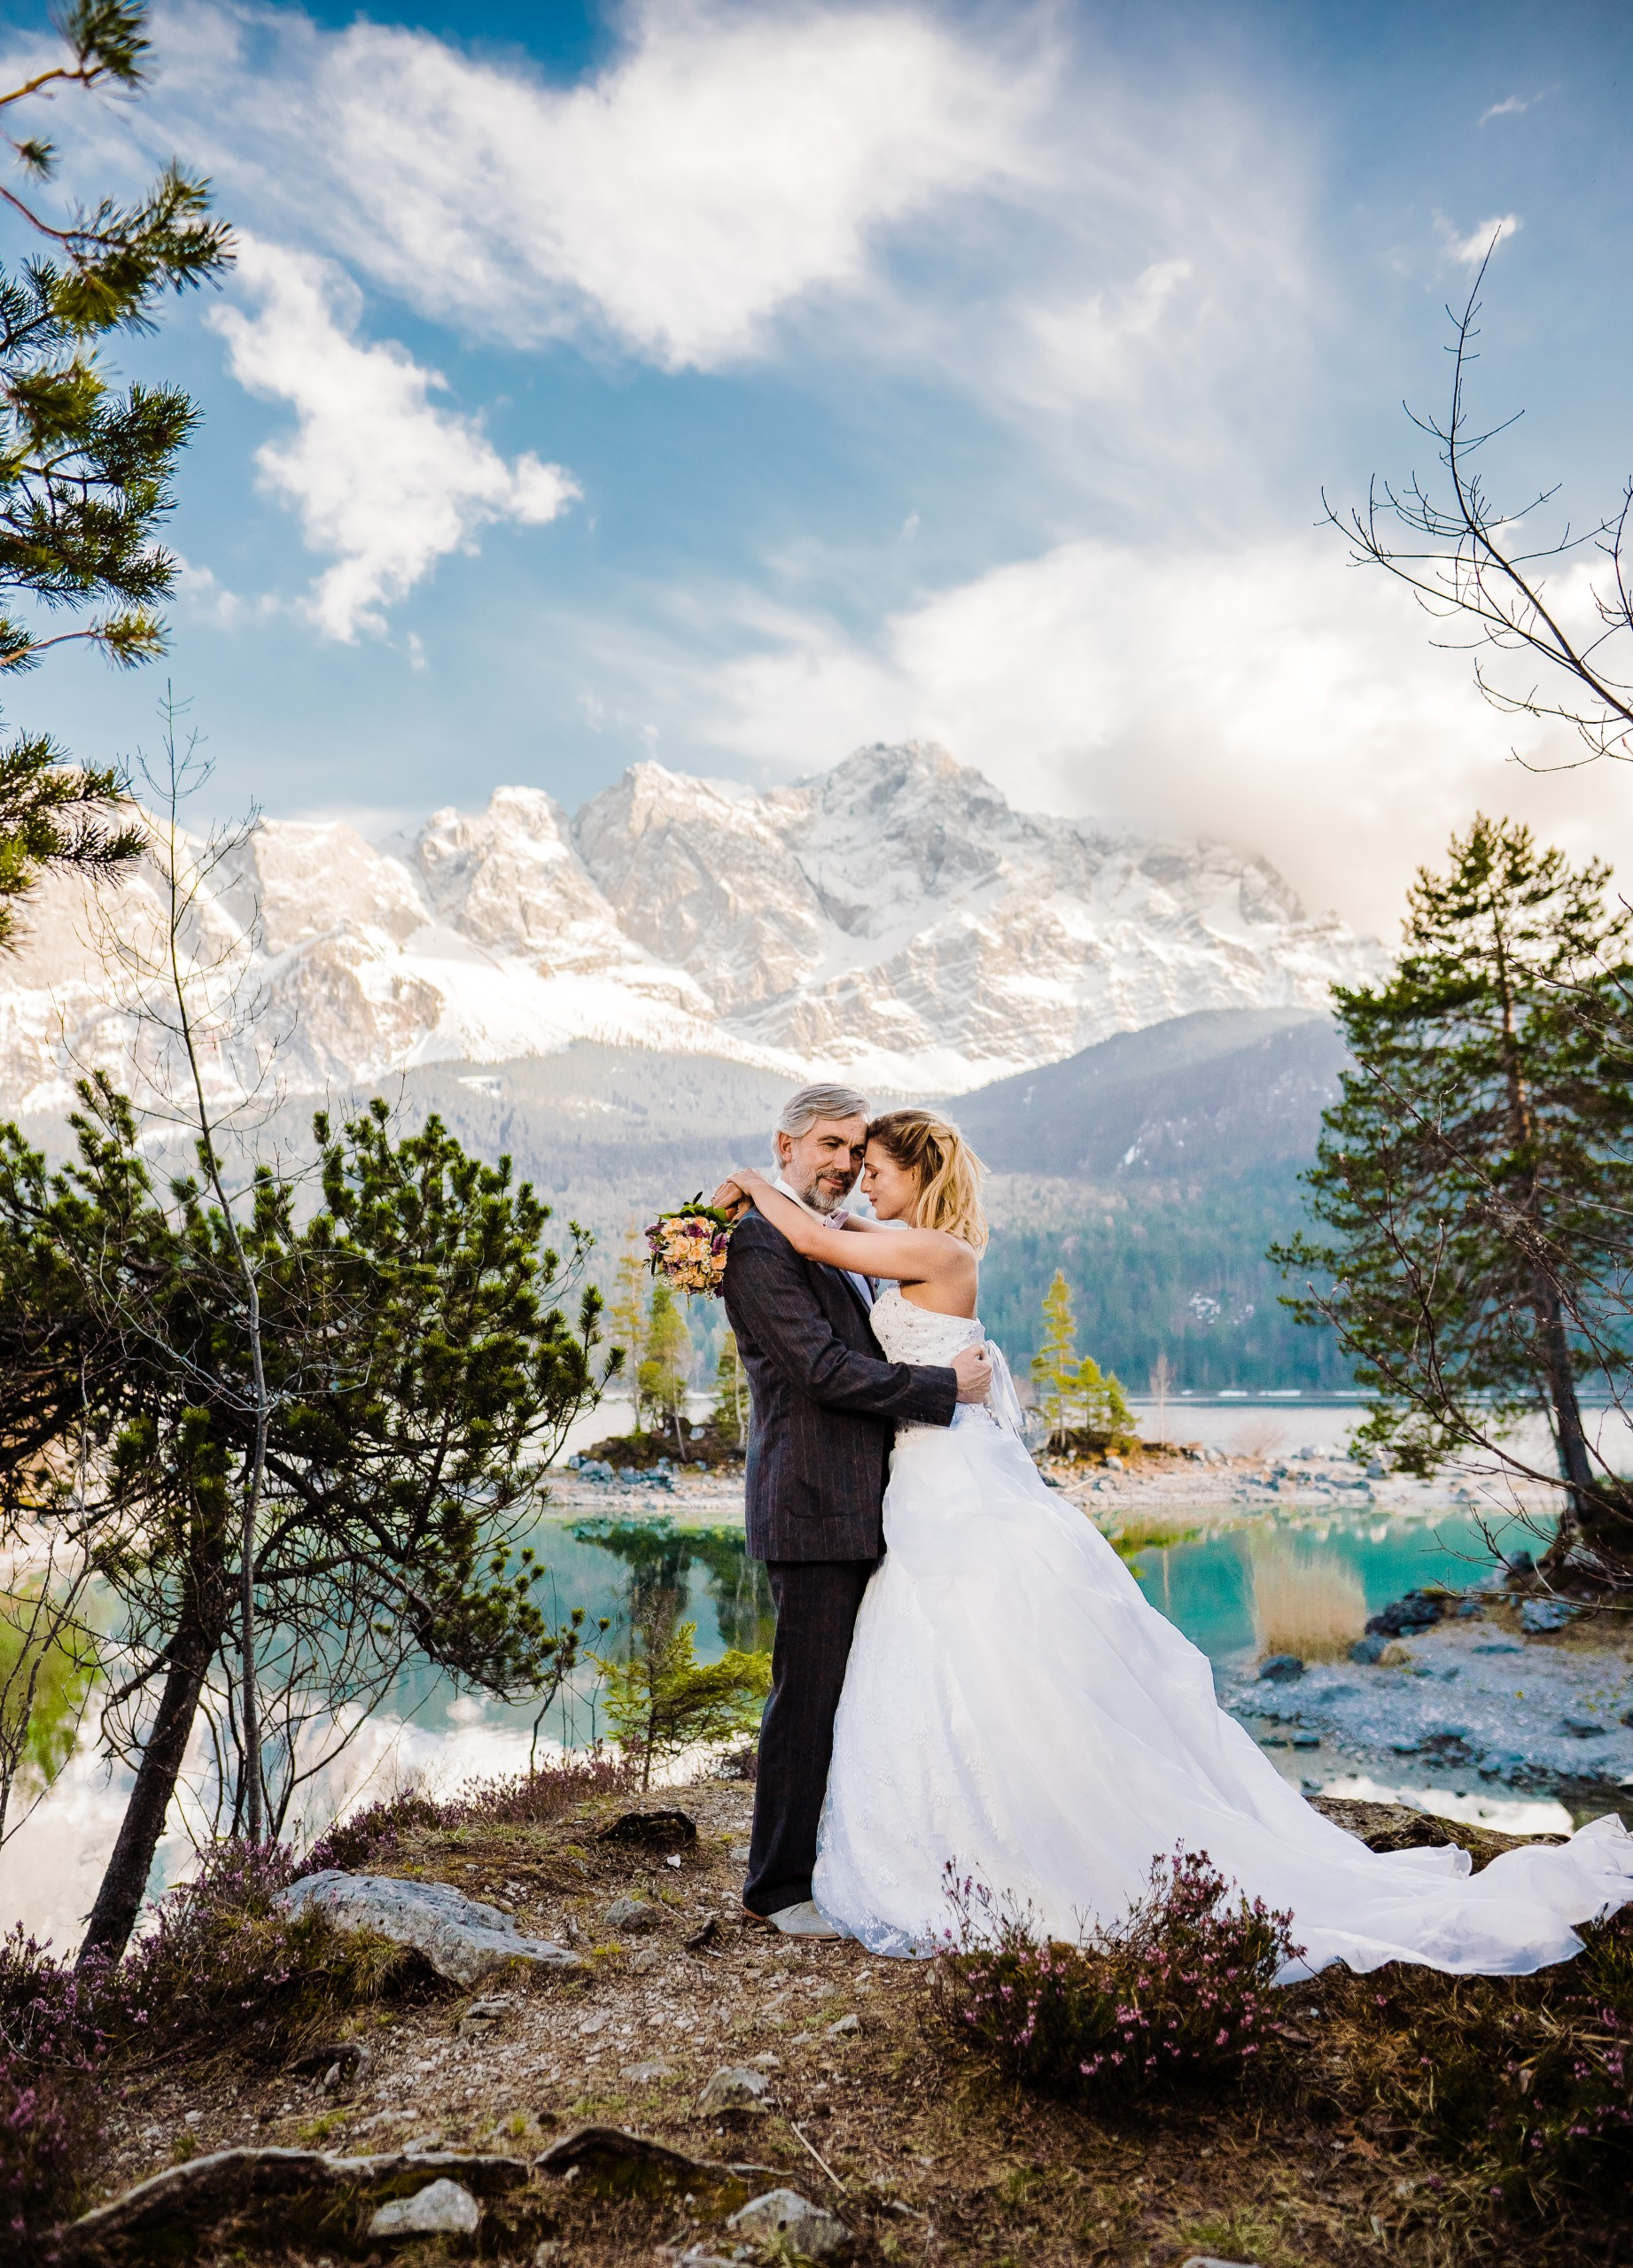 Afterwedding am Eibsee